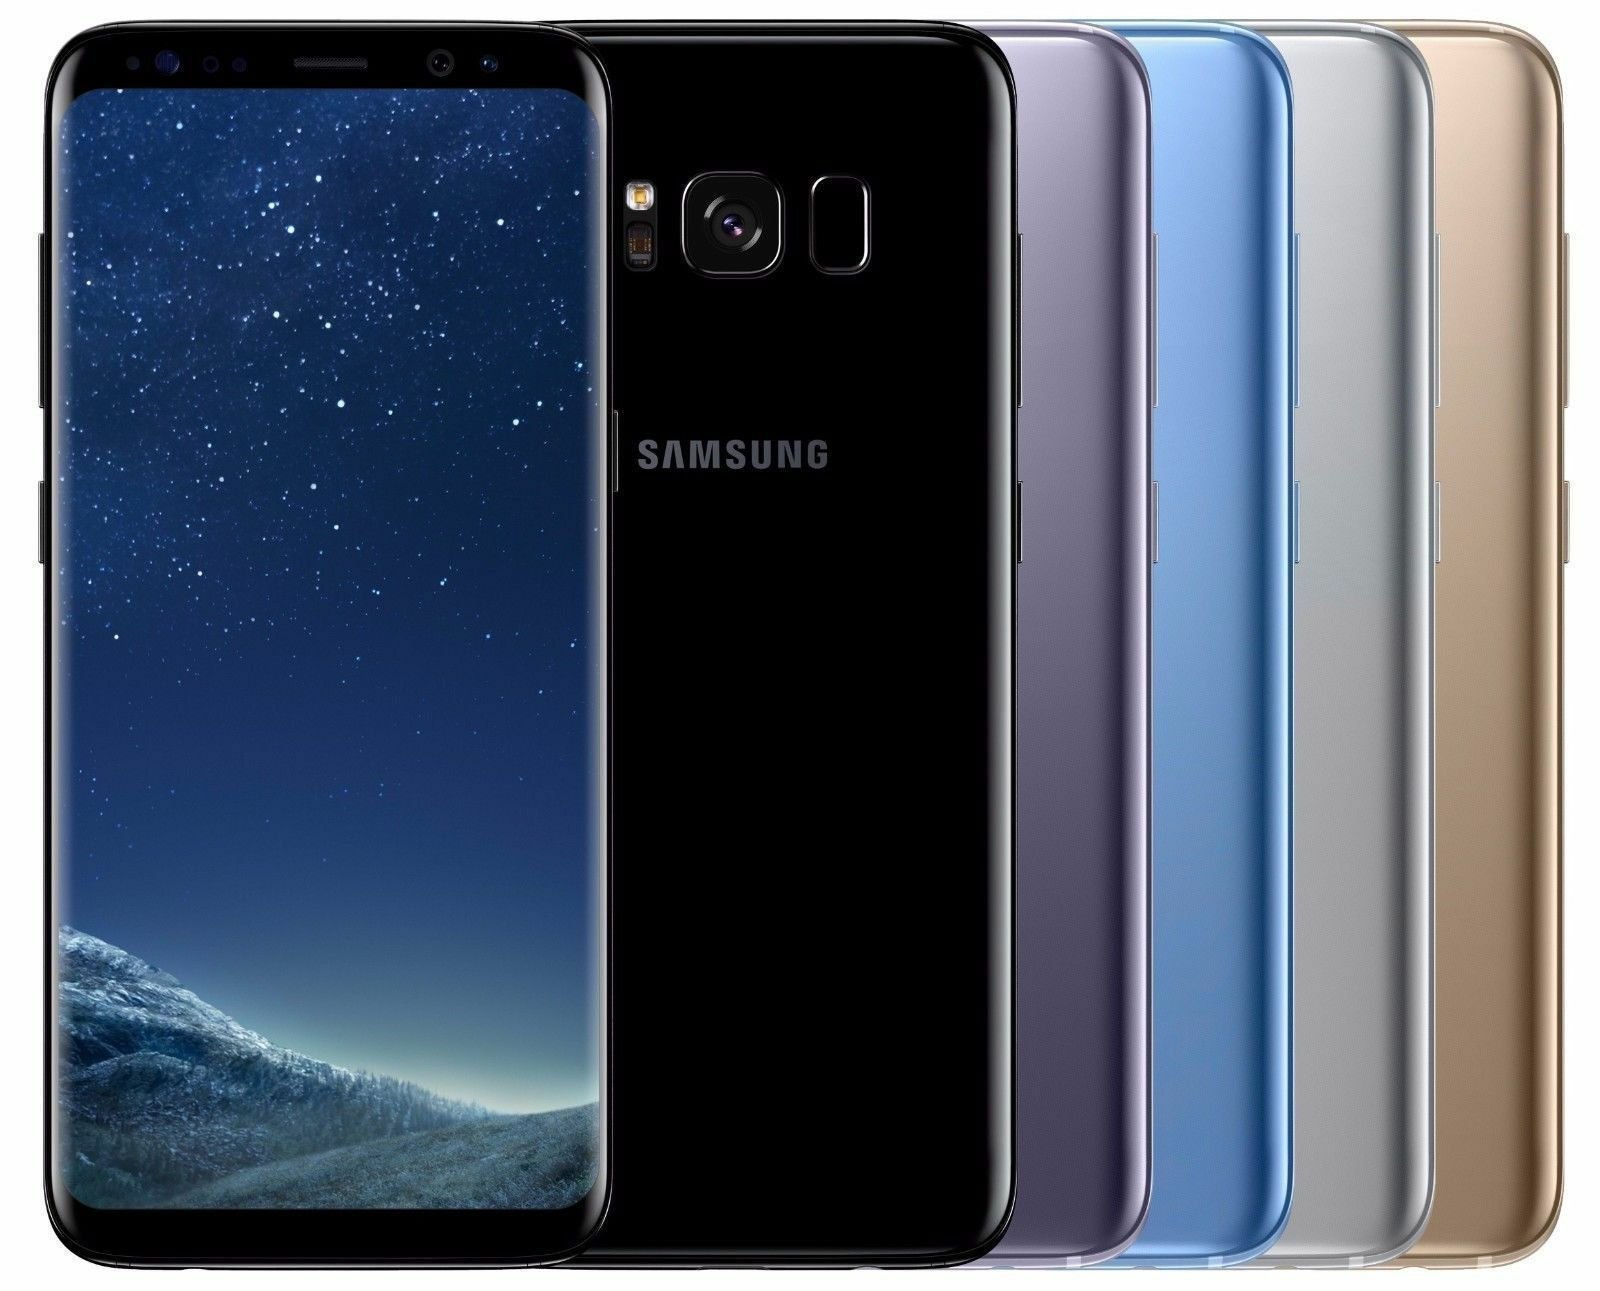 New Samsung Galaxy S8 SM-G950U 64GB Unlocked AT&T T-Mobile MetroPCs Smartphone